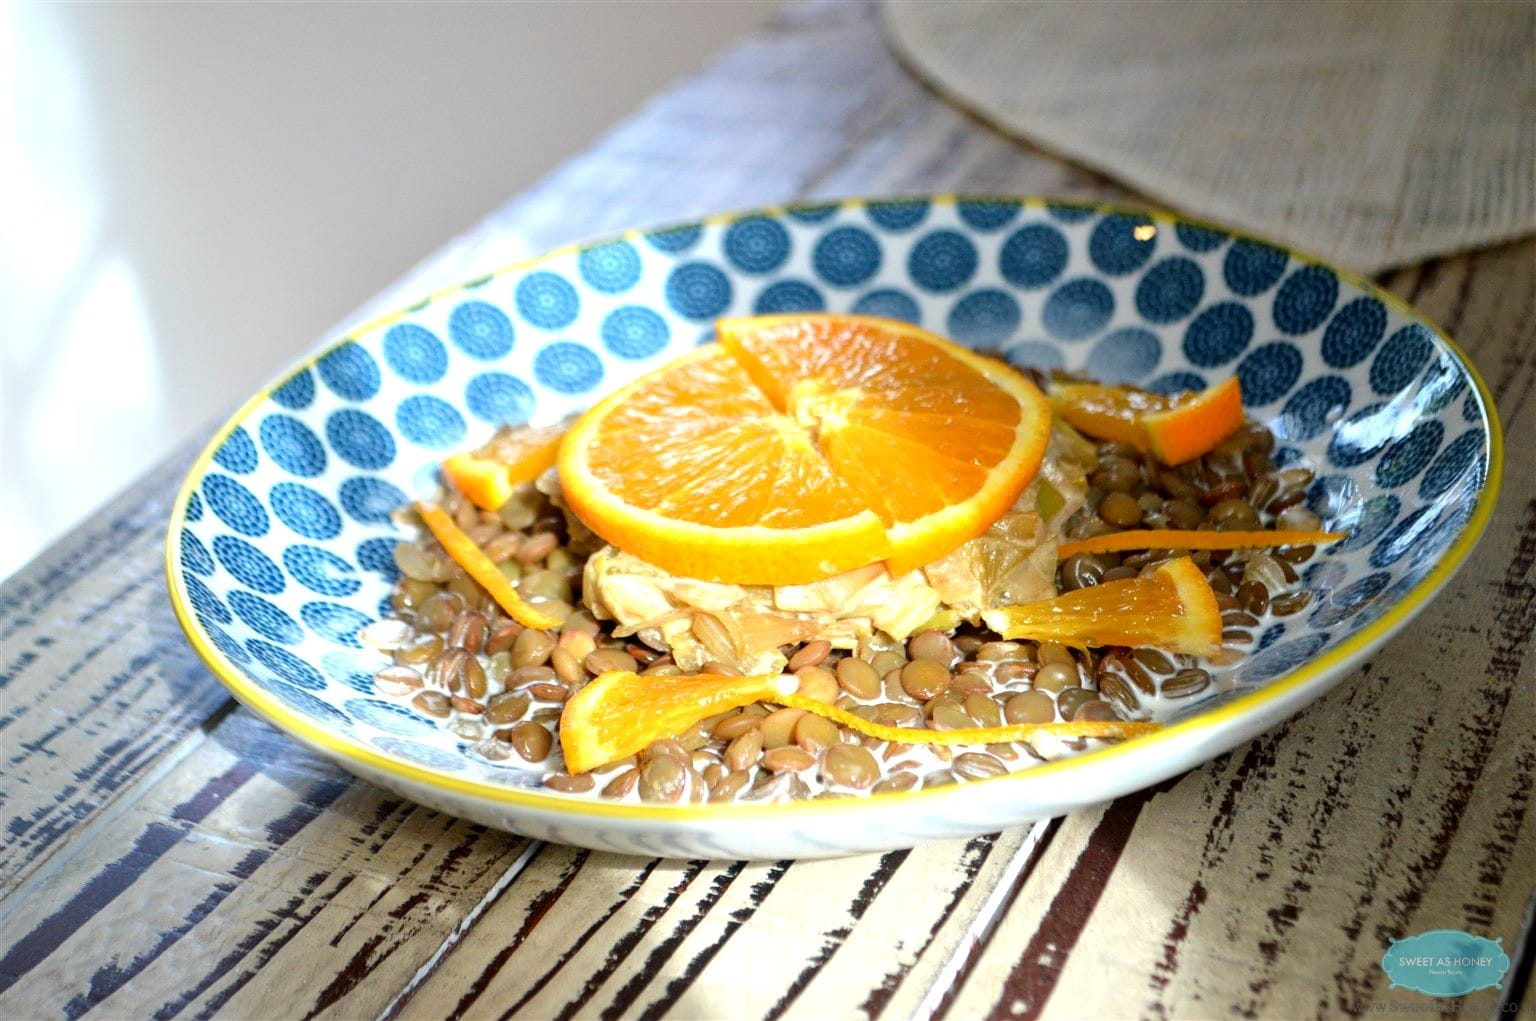 Green Lentils Leek with a Creamy Orange Sauce